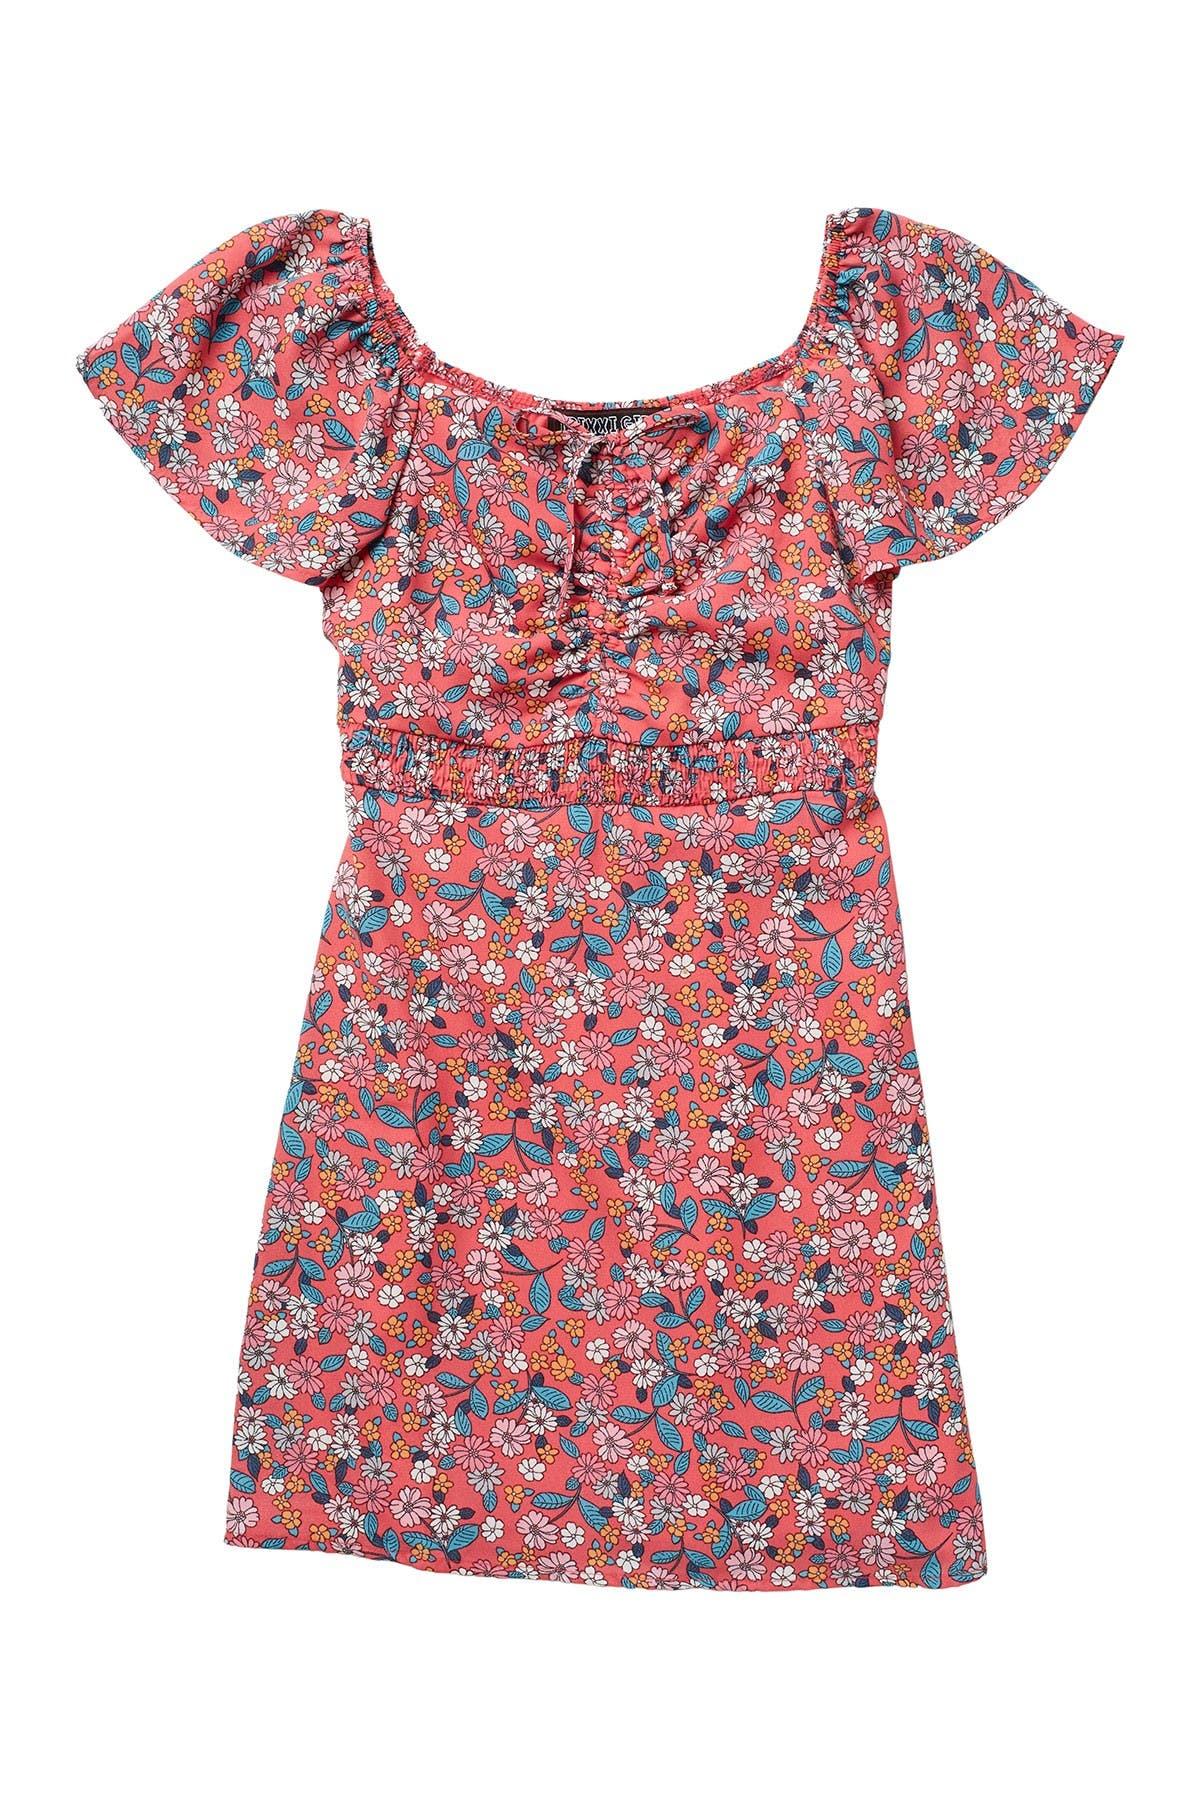 Image of Trixxi Smocked Waist Floral Print Dress